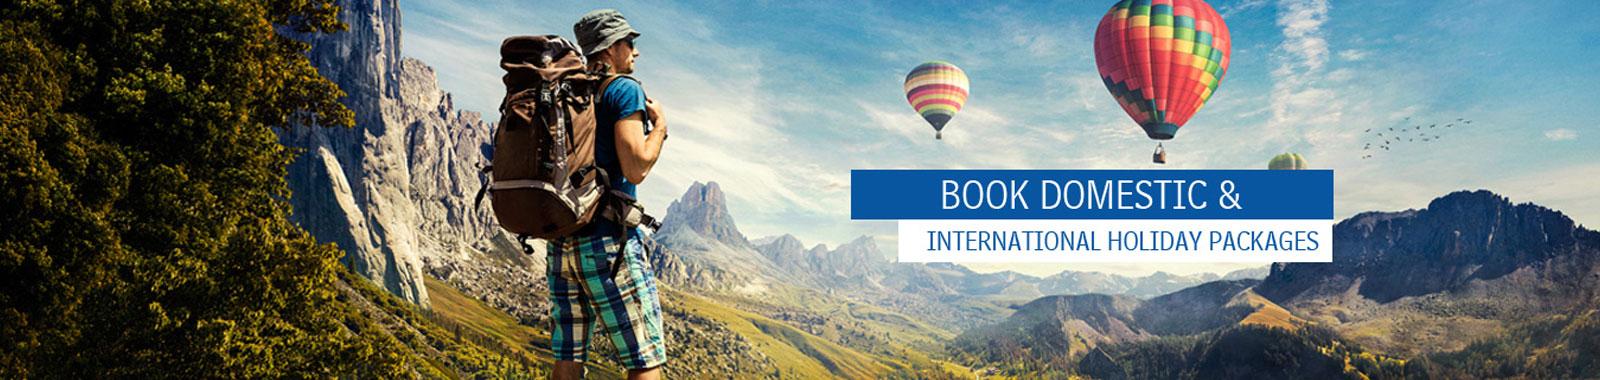 International Domestic Packages | La Esperanza Travels